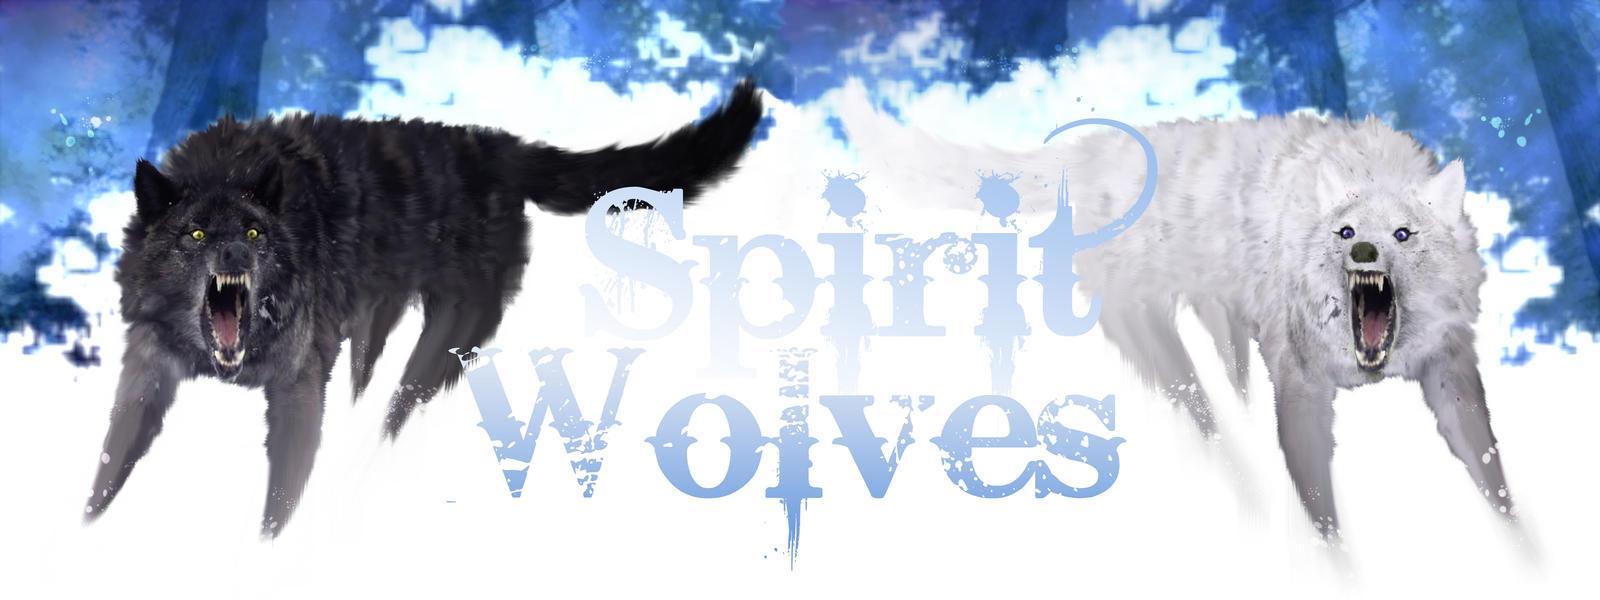 Spirit wolves by pezfish26